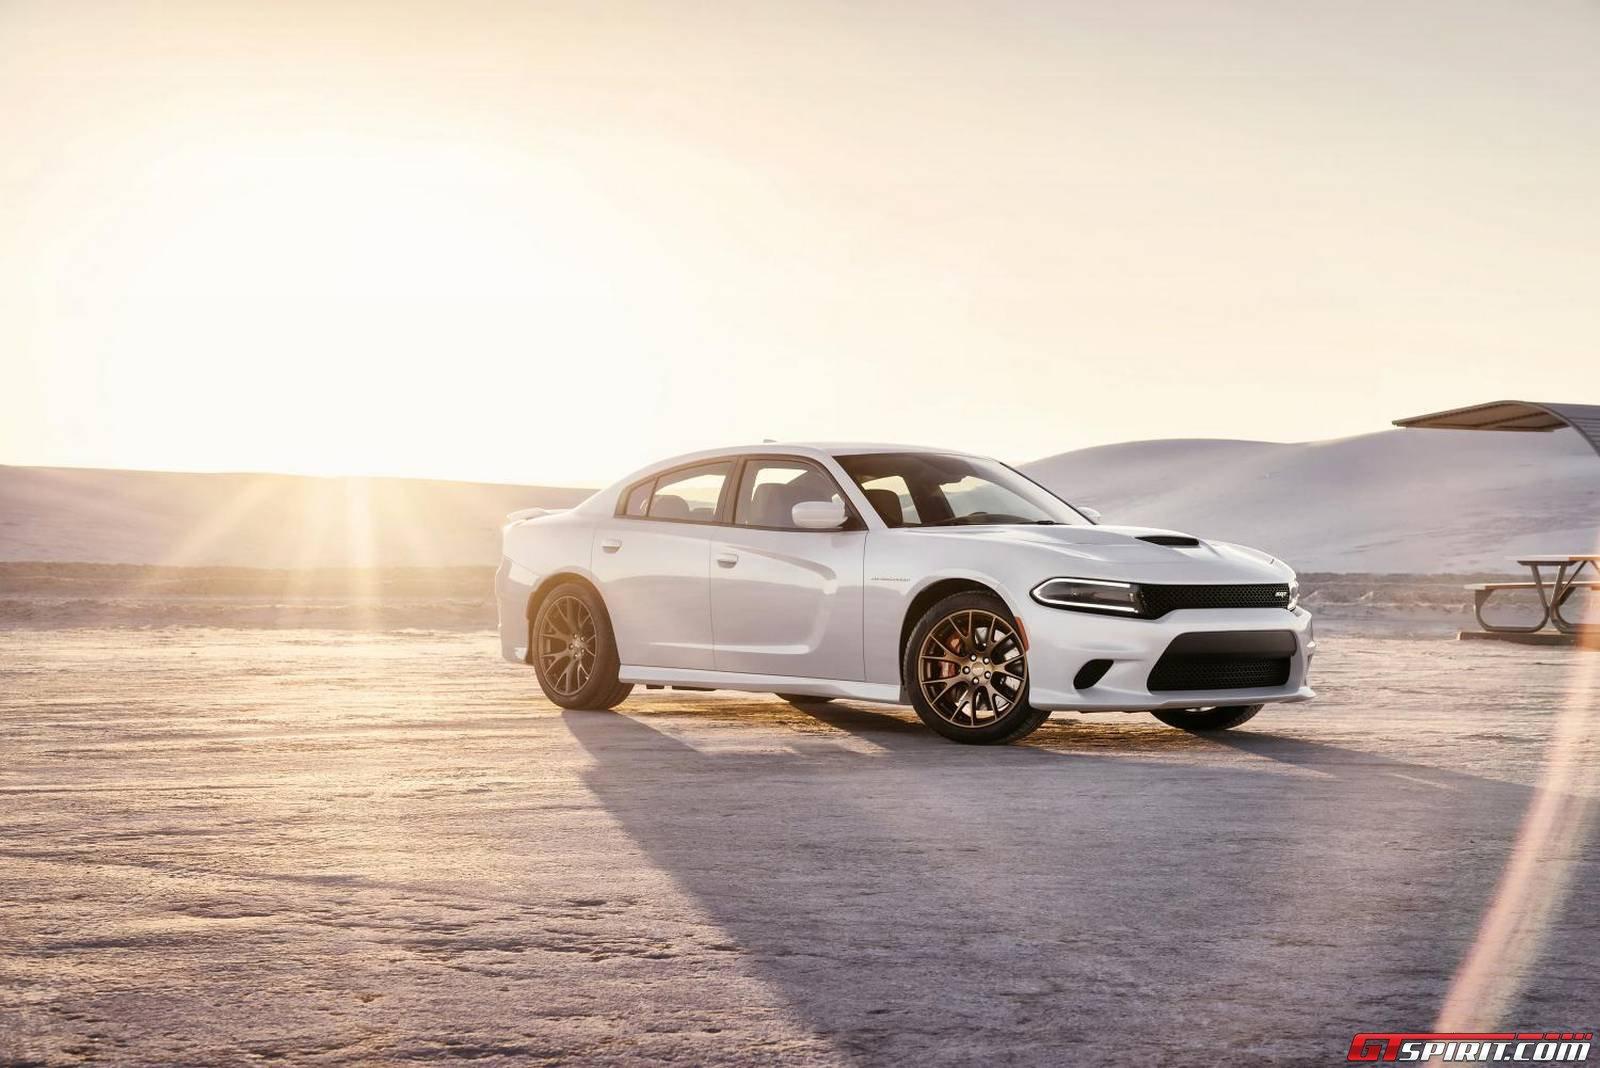 Dodge Charger Srt Hellcat Convertible Imagined Gtspirit